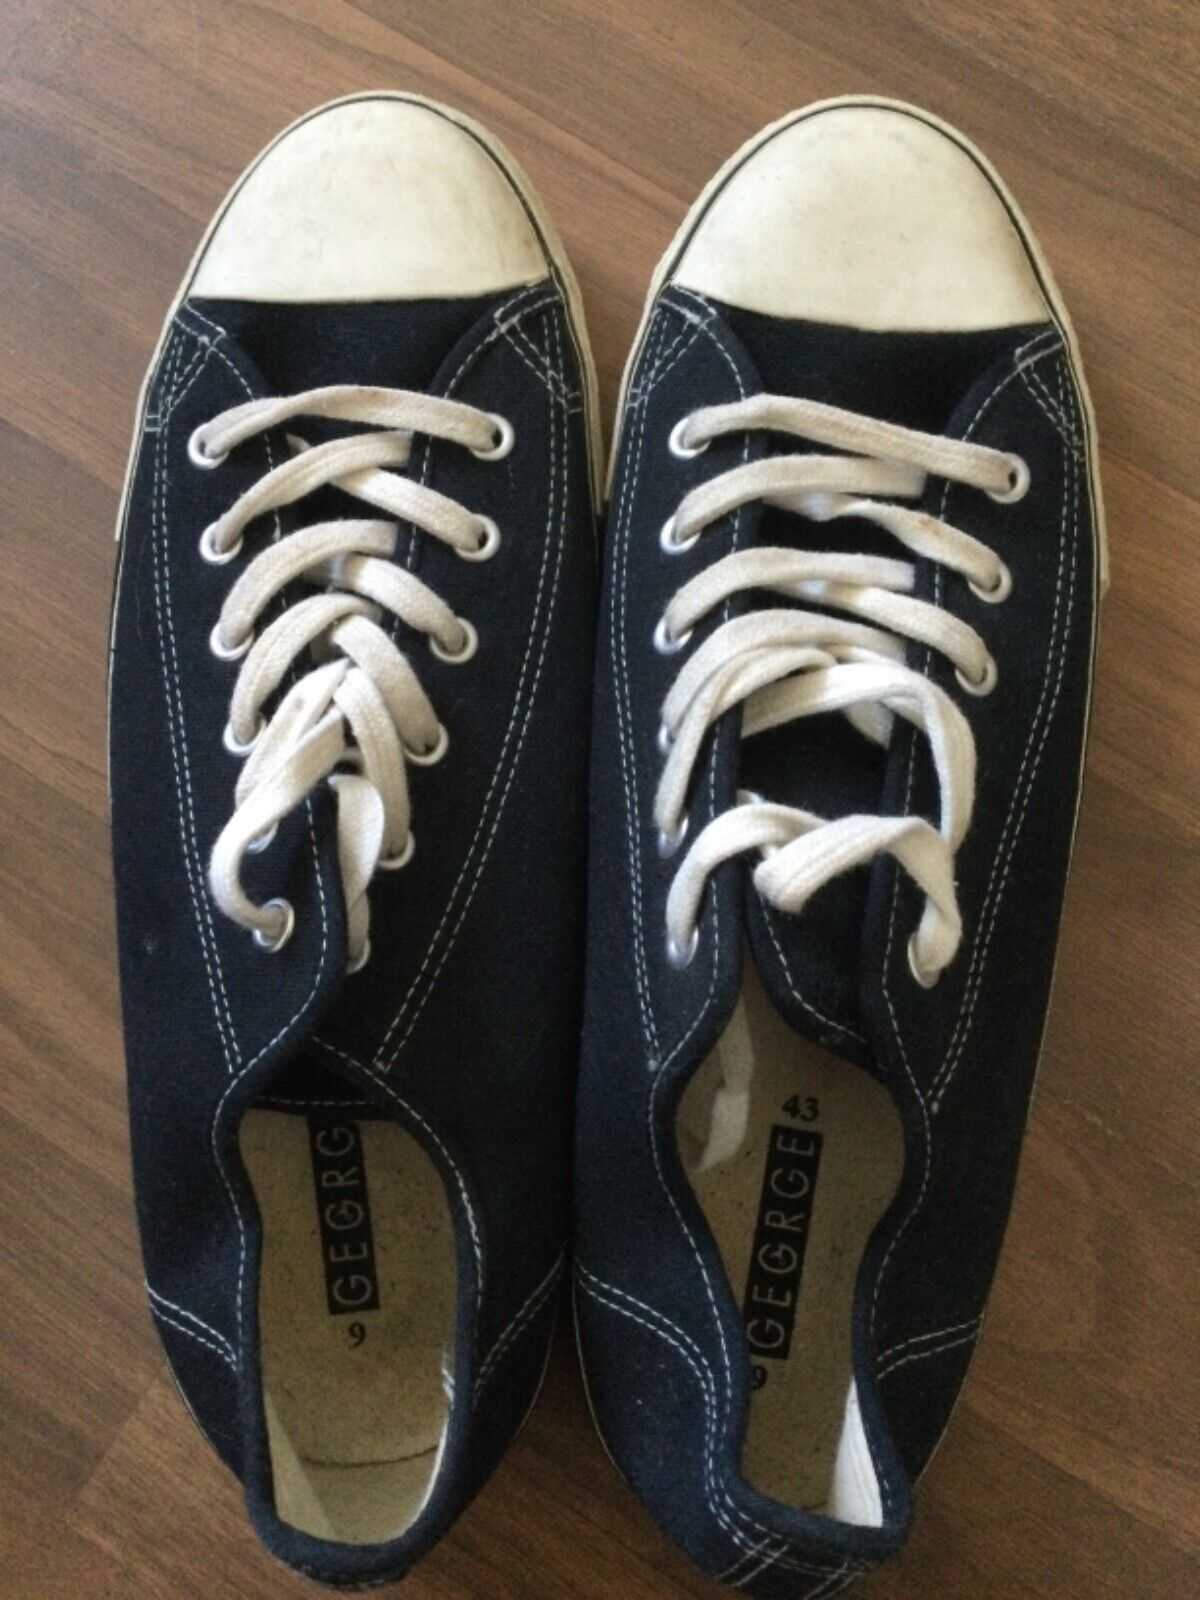 Men's George nave blue lace up sandshoes size 9